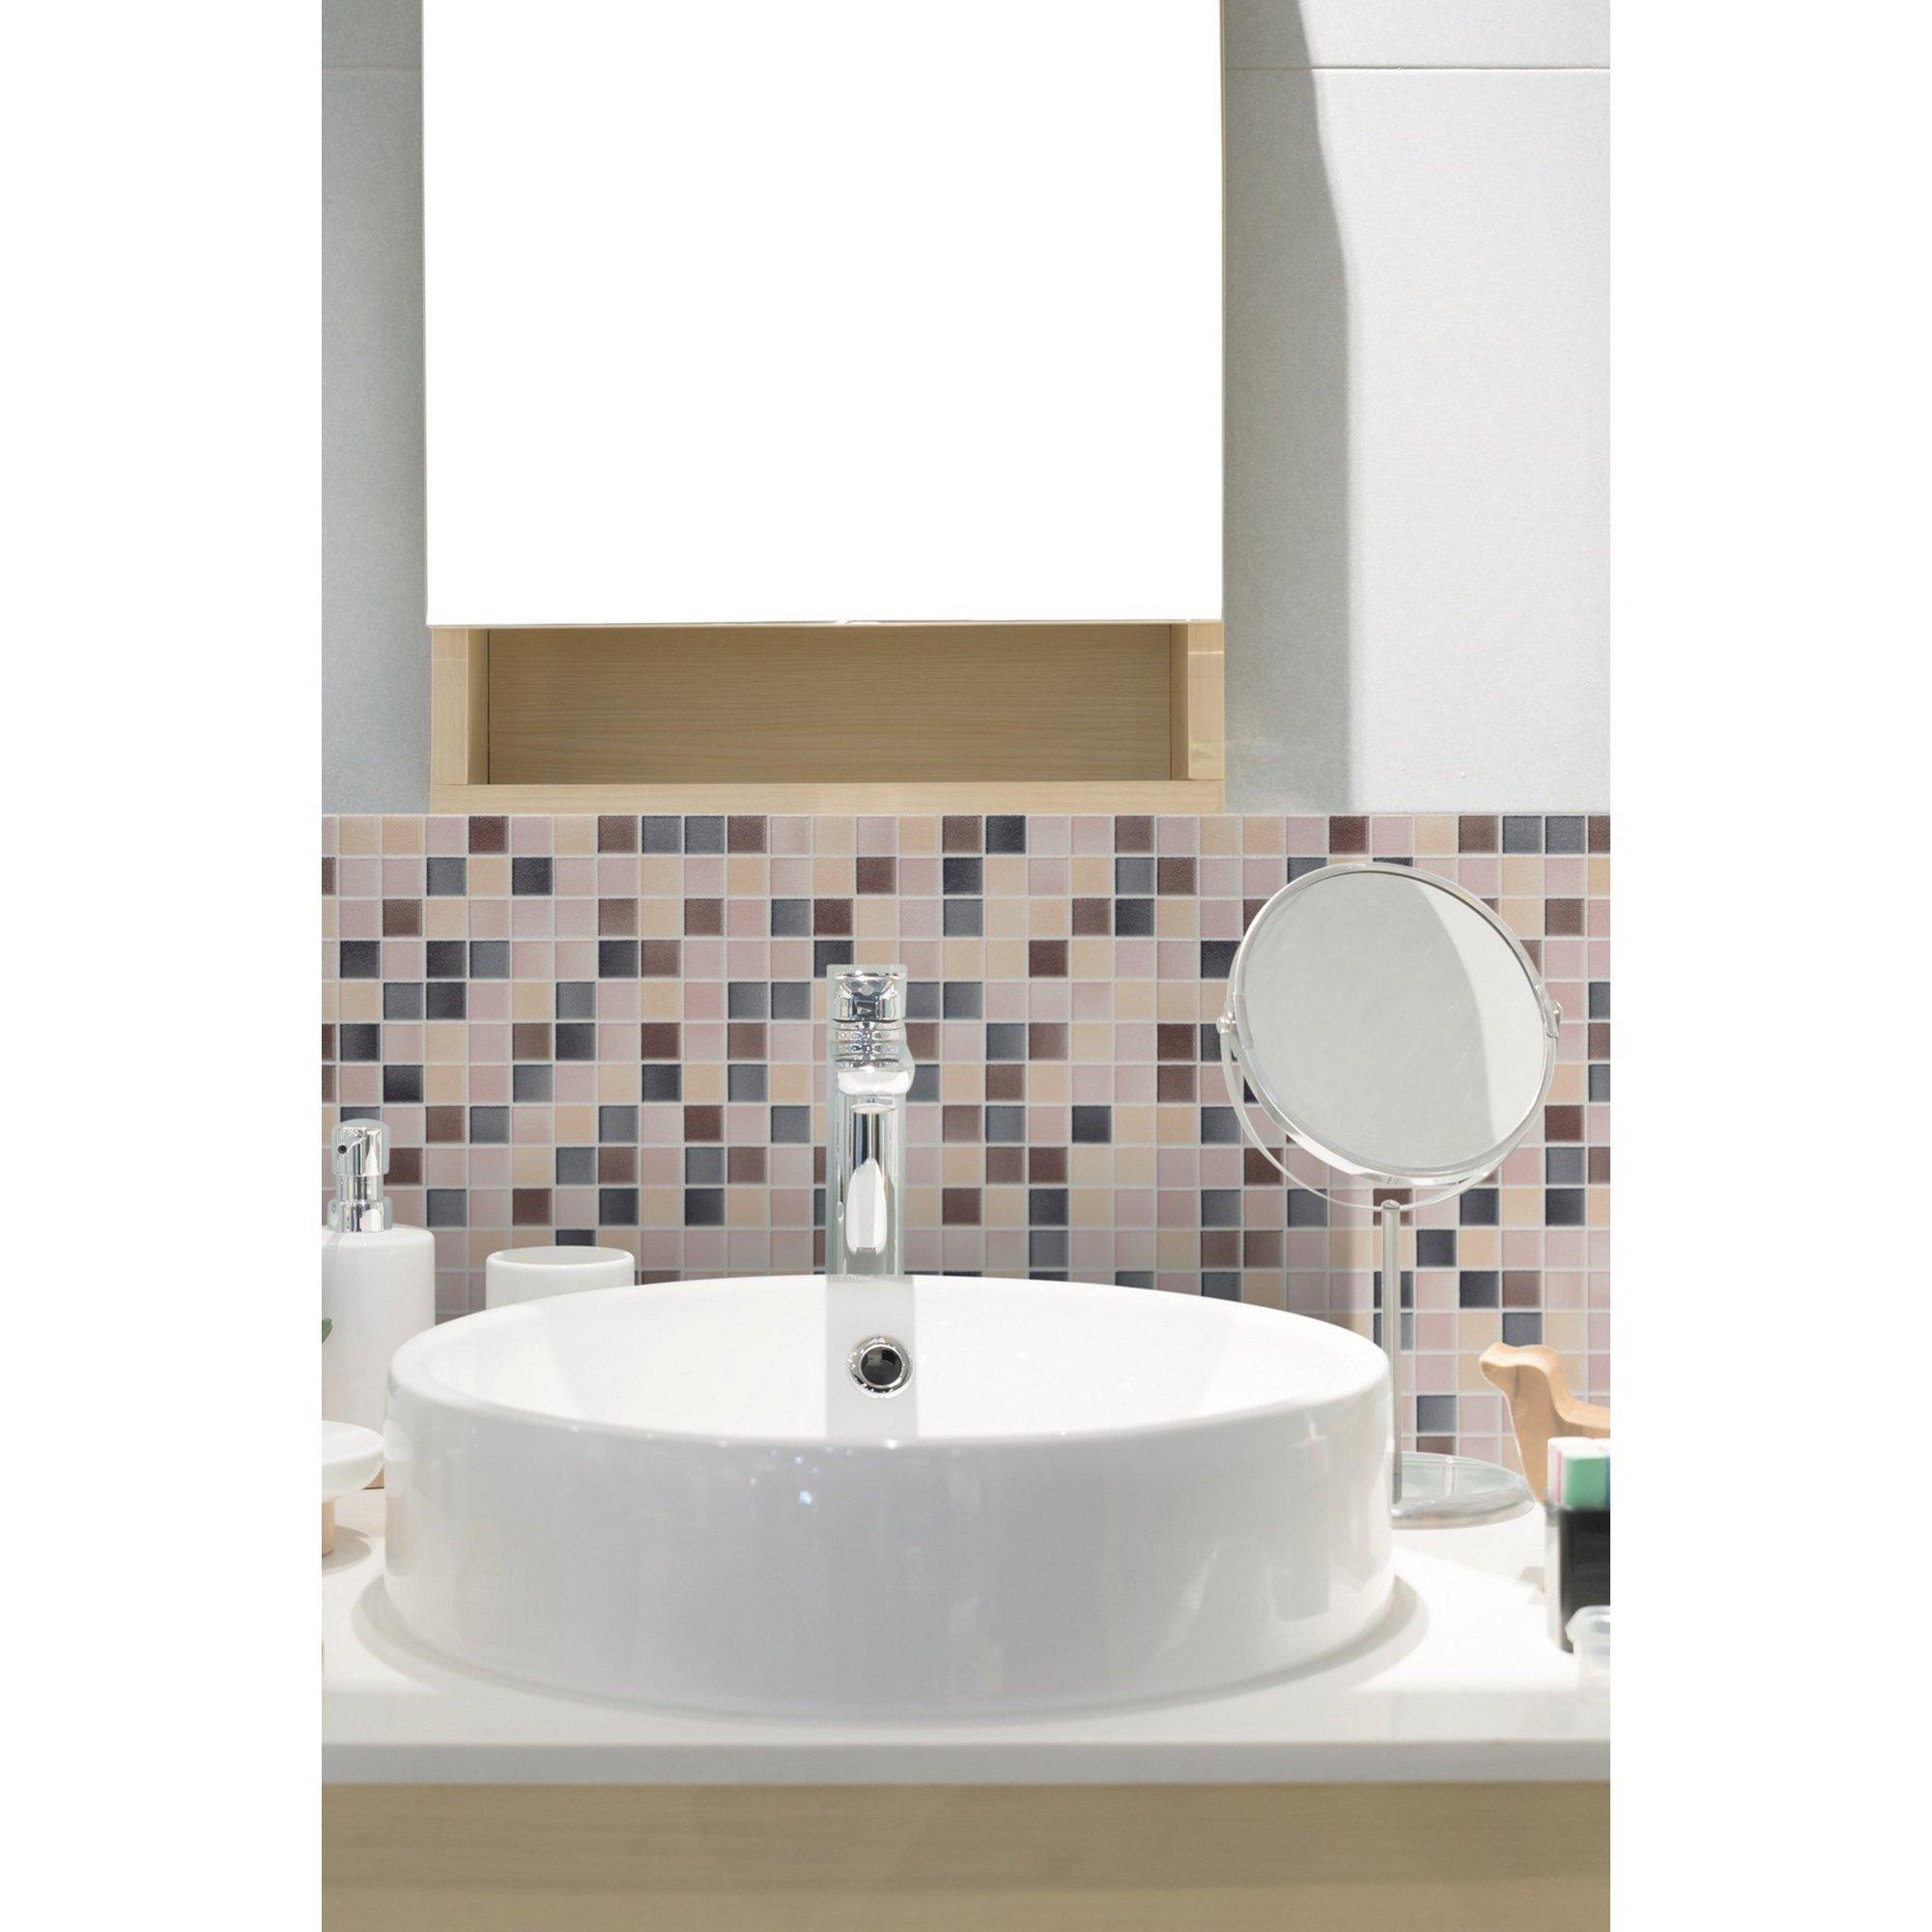 Image of D-C-Fix 3D Wallpaper for Splashbacks Mosaic Carrara